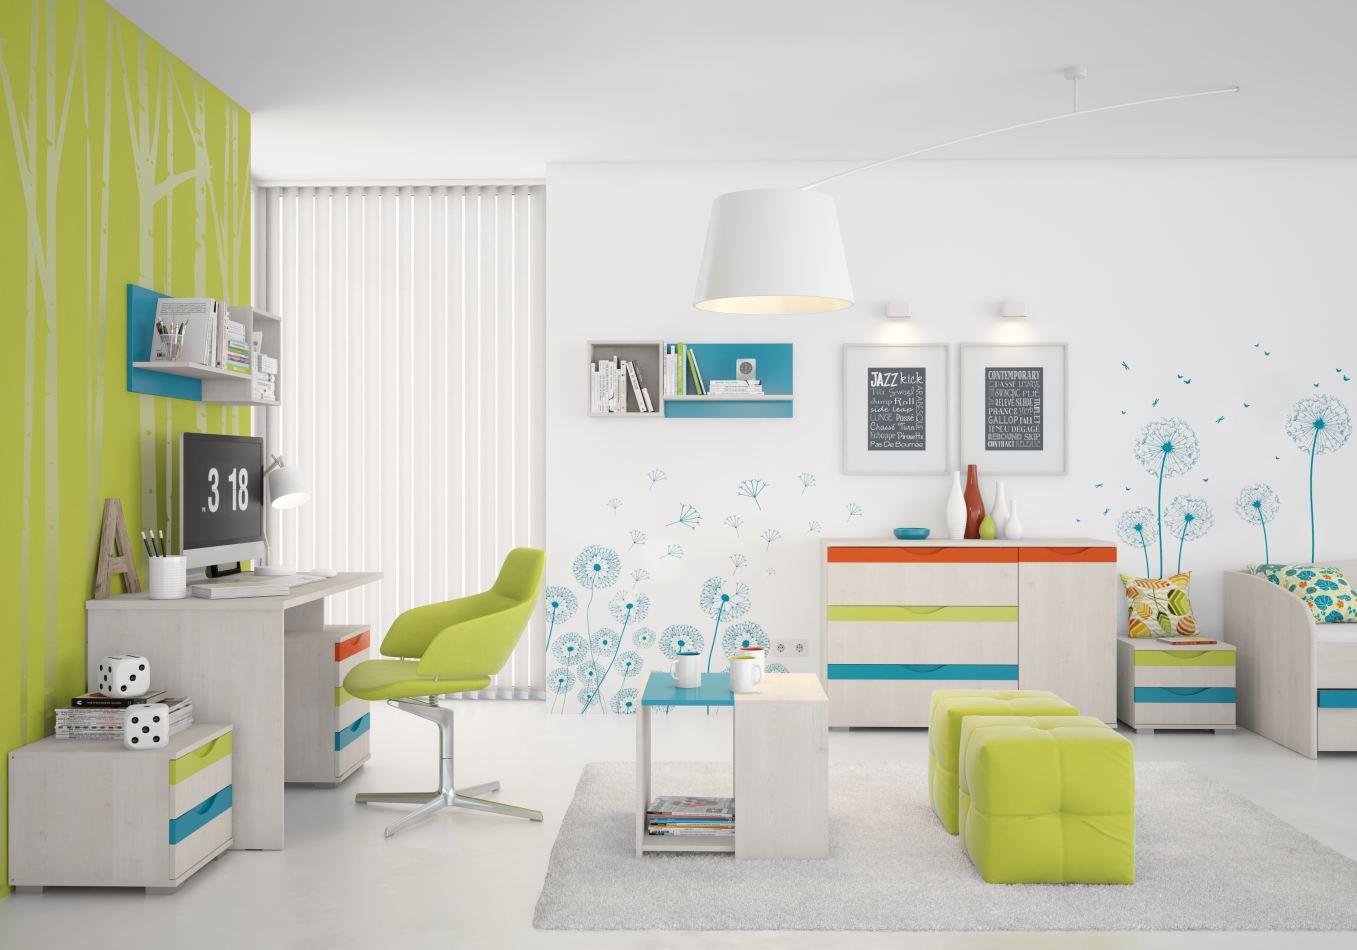 Kinderzimmer Komplett - Set A Peter, 9-teilig, Farbe: Kiefer Weiß / Orange / Gelb / Türkis